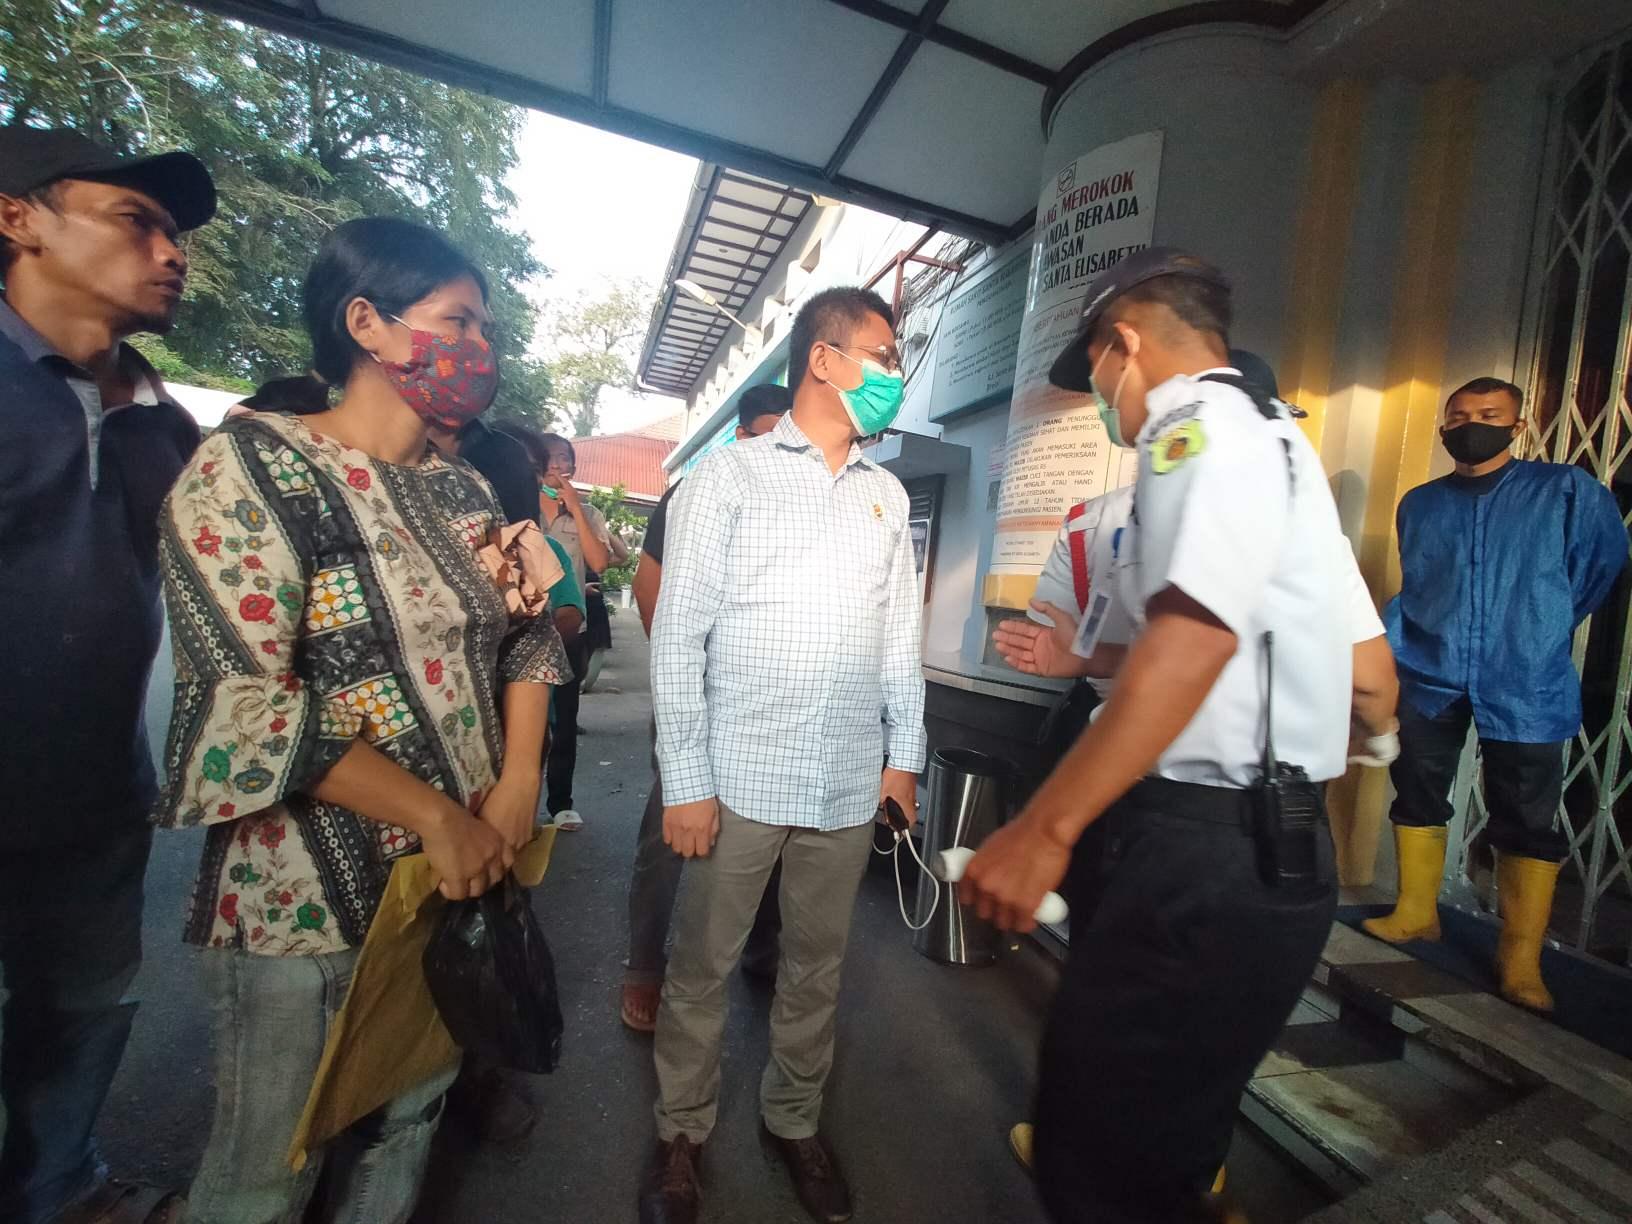 Tolak Pemulasaran Sesuai Protokol, Keluarga Almarhum Protes RS Elisabeth